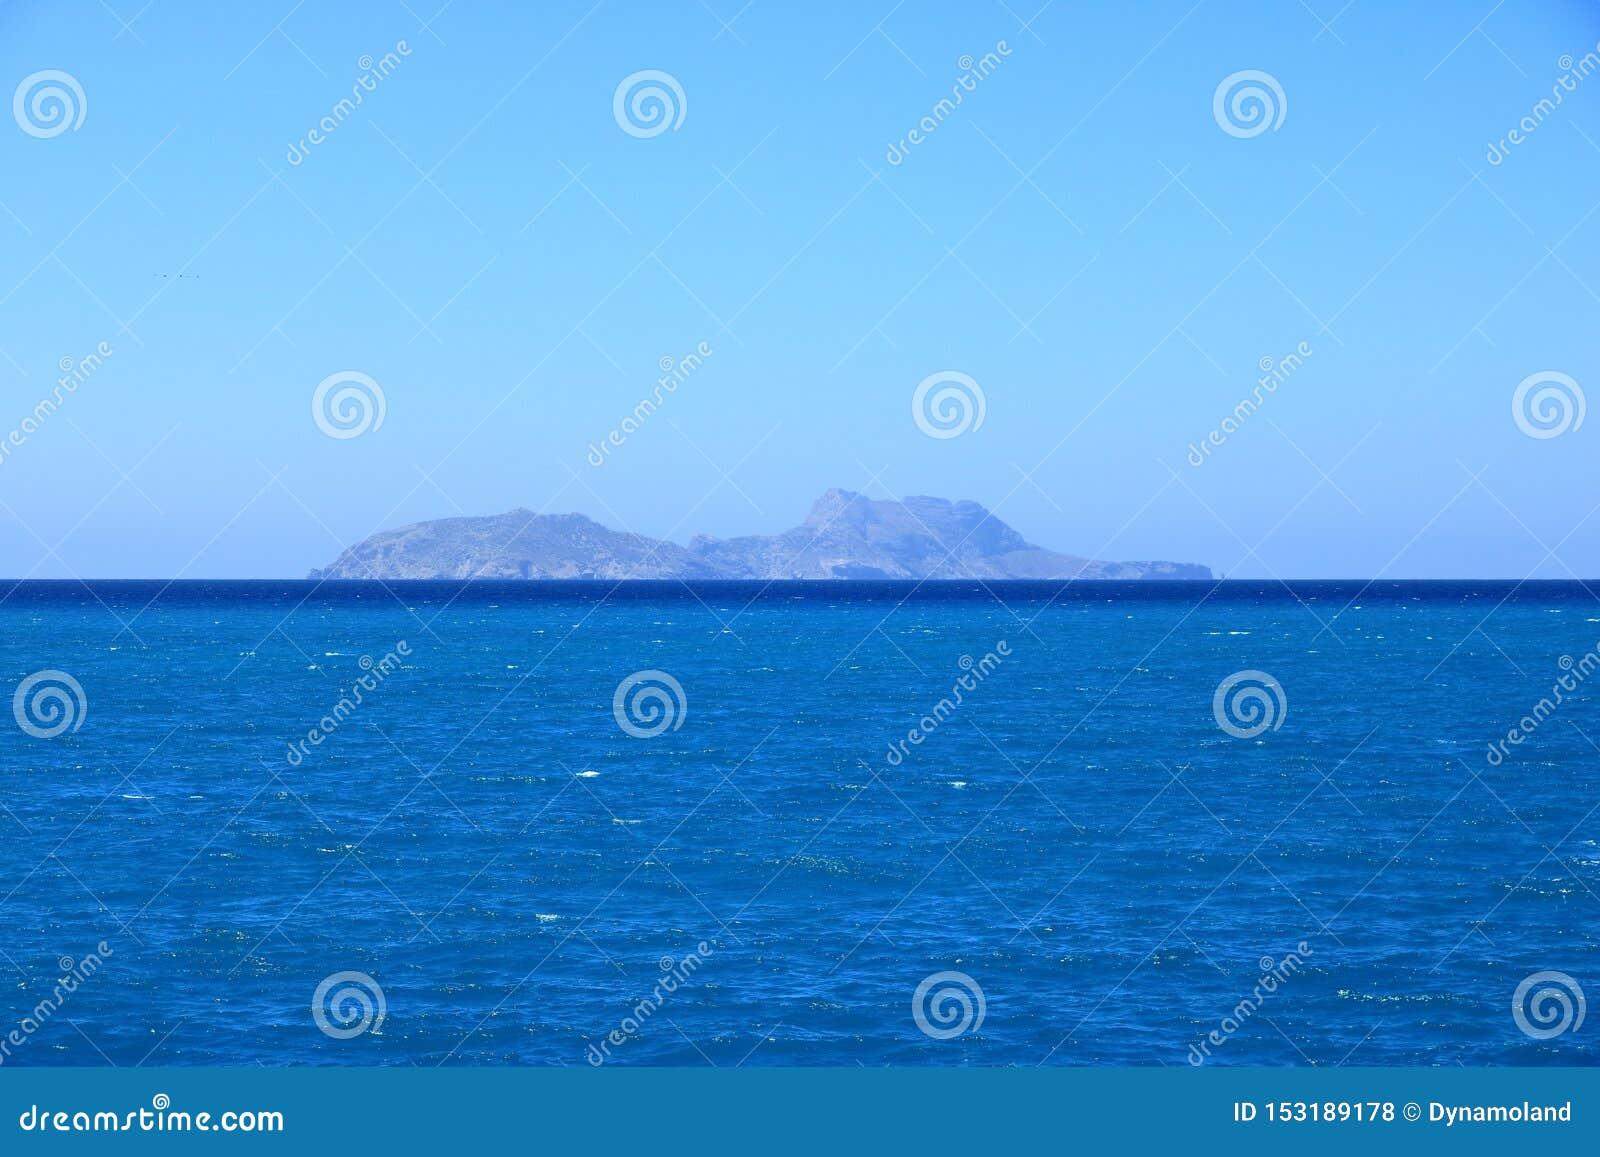 Agia Galini Beach in Crete island, Greece